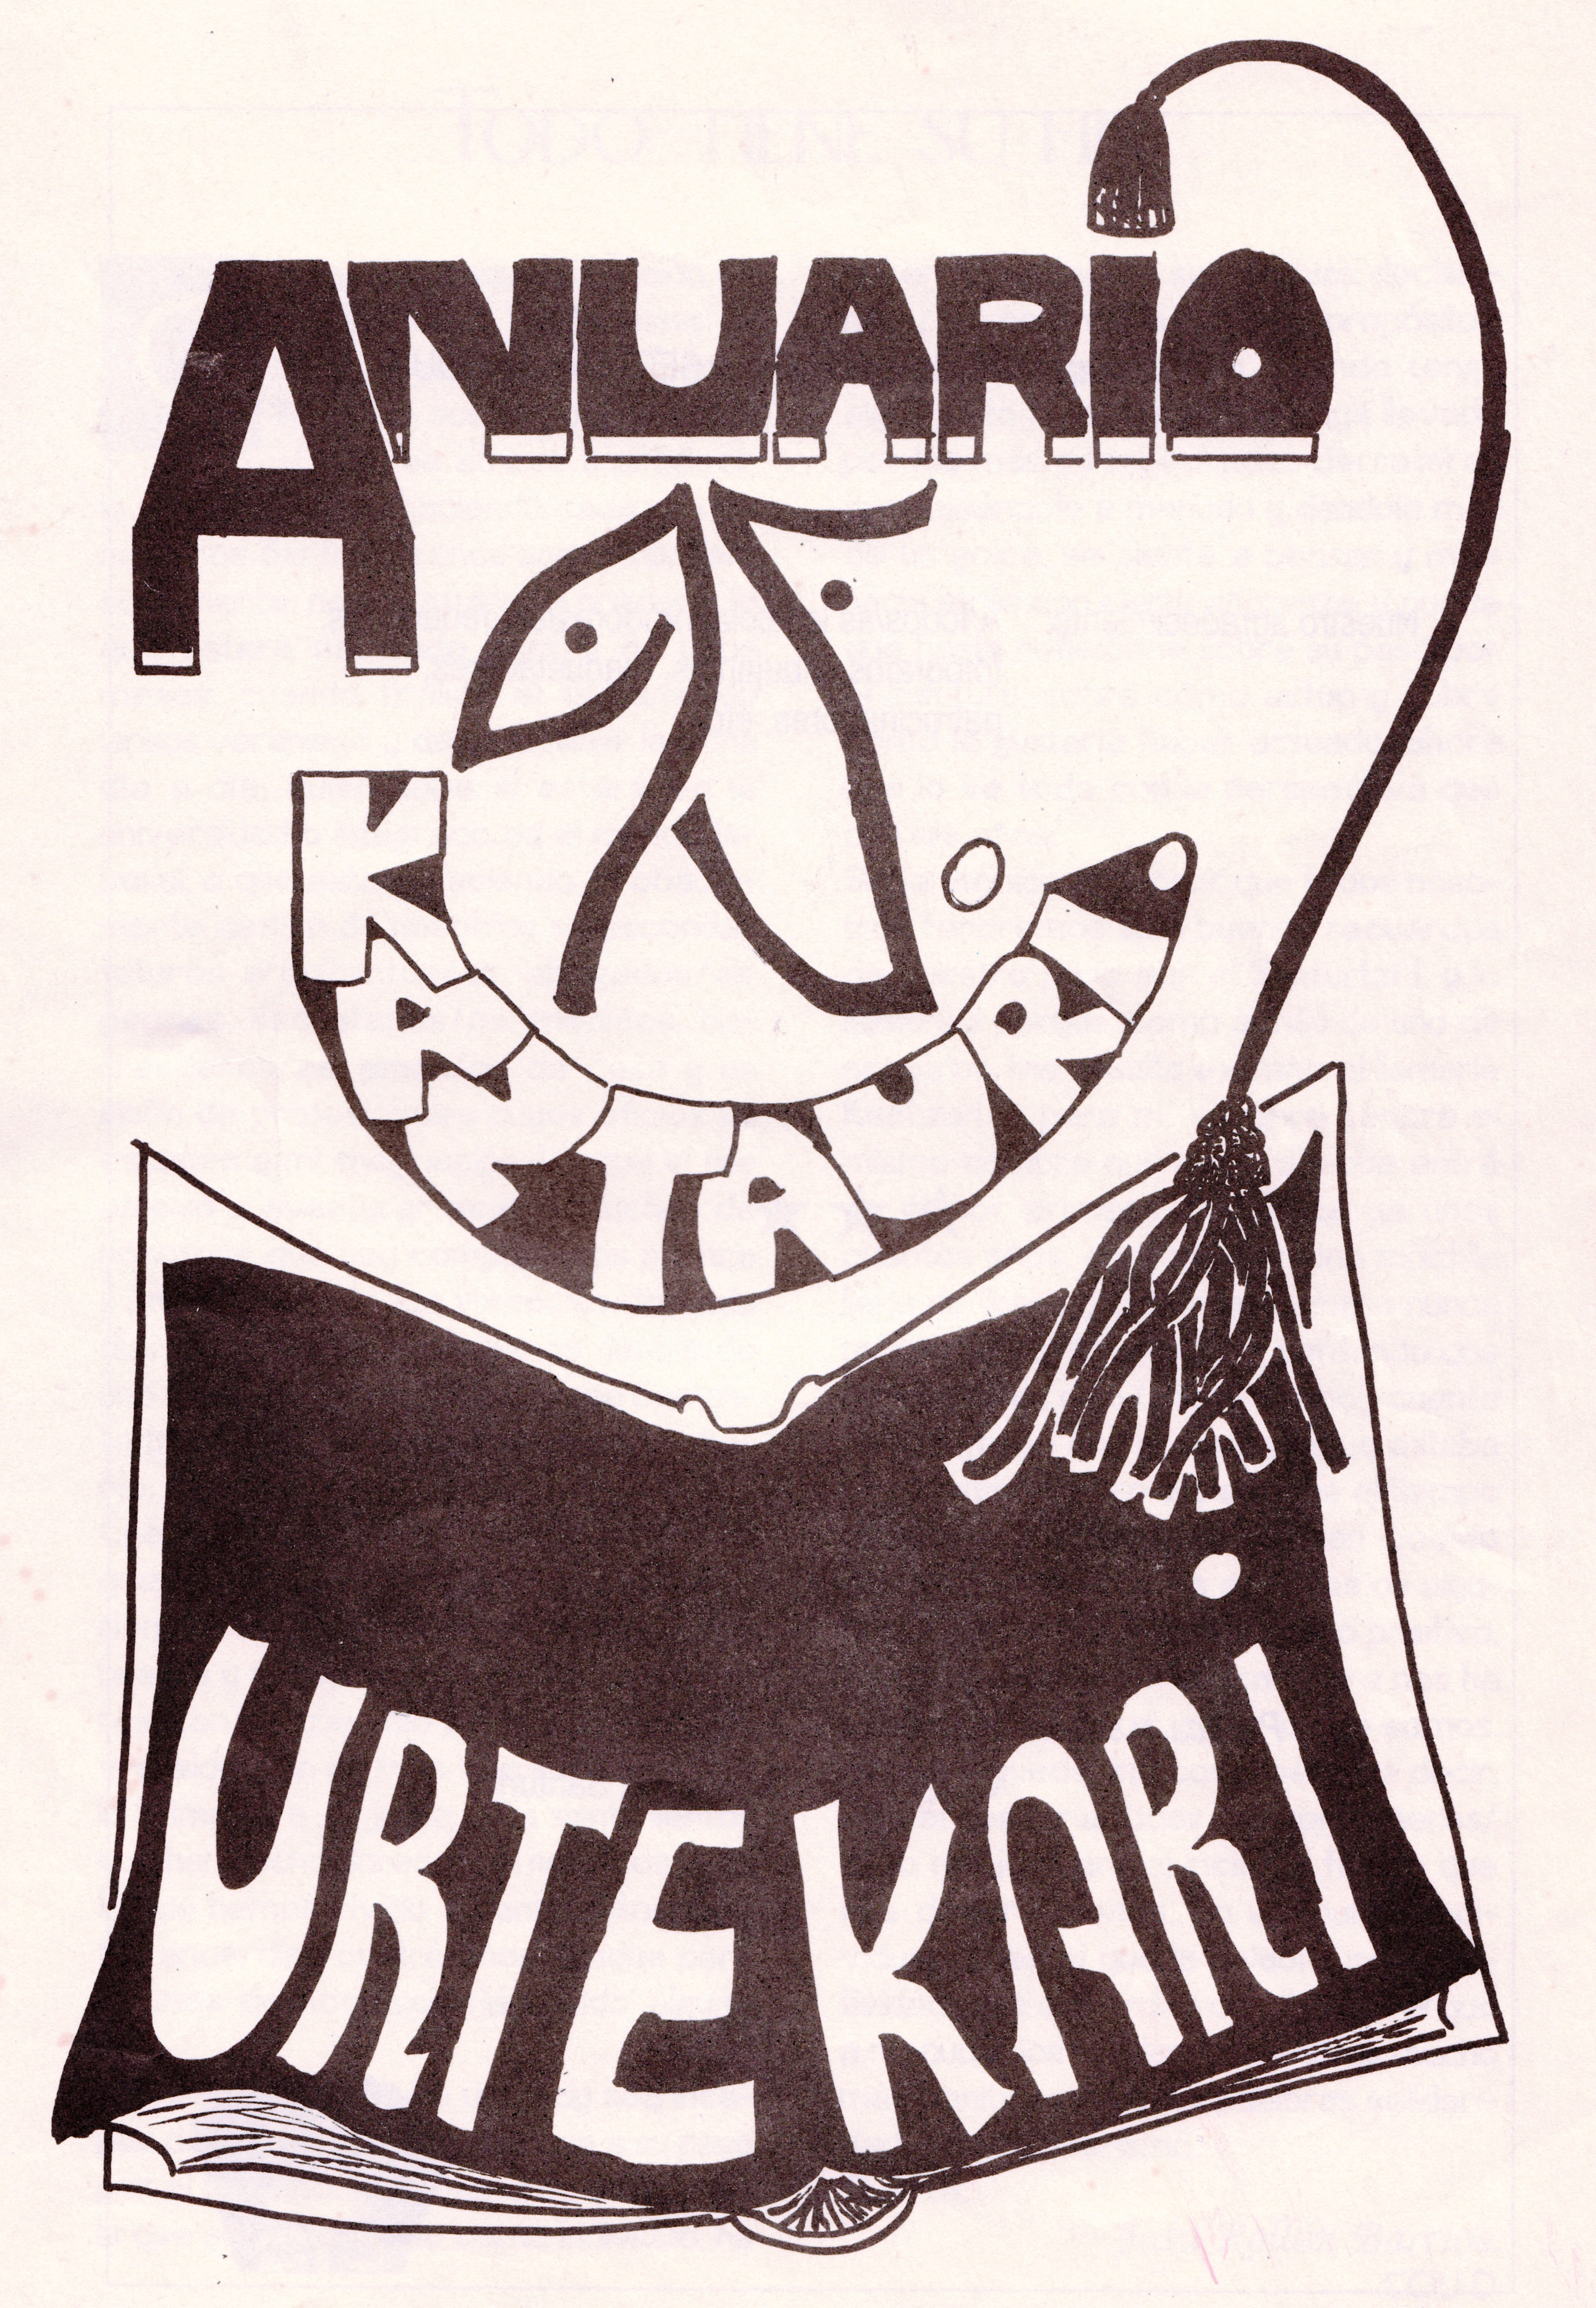 Anuario Kantauri